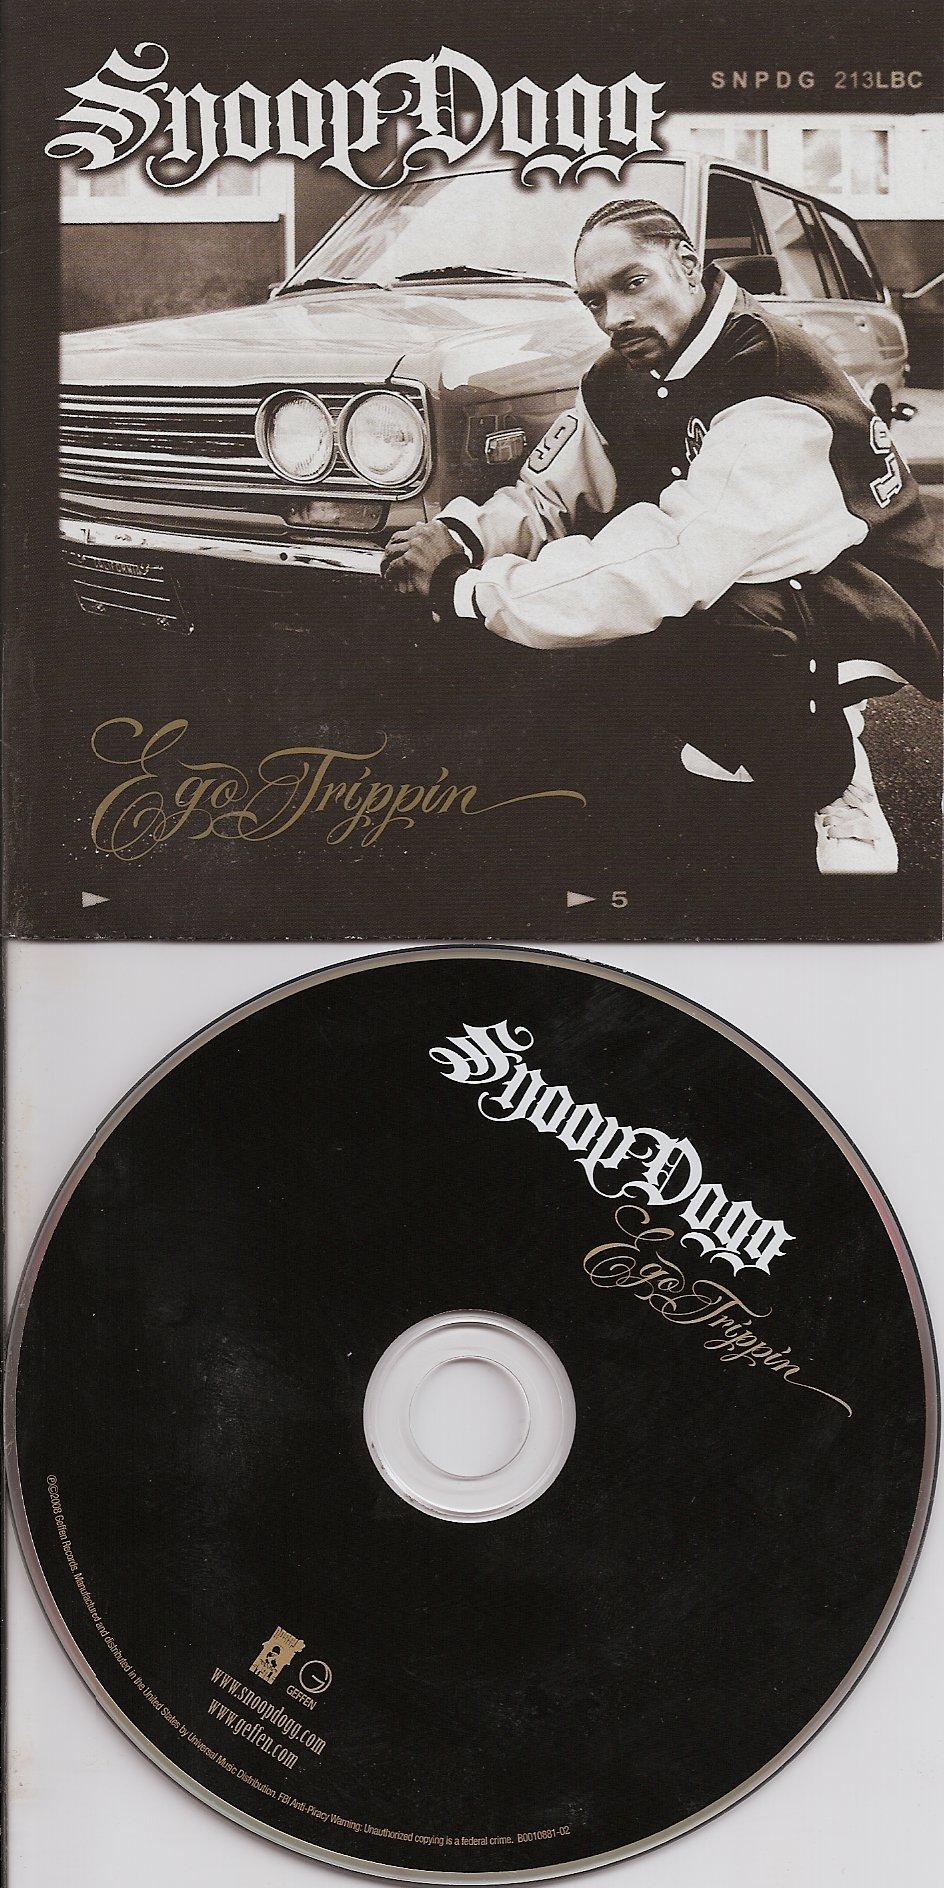 00snoopdoggegotrippincleanalbum2008cmscover.jpg